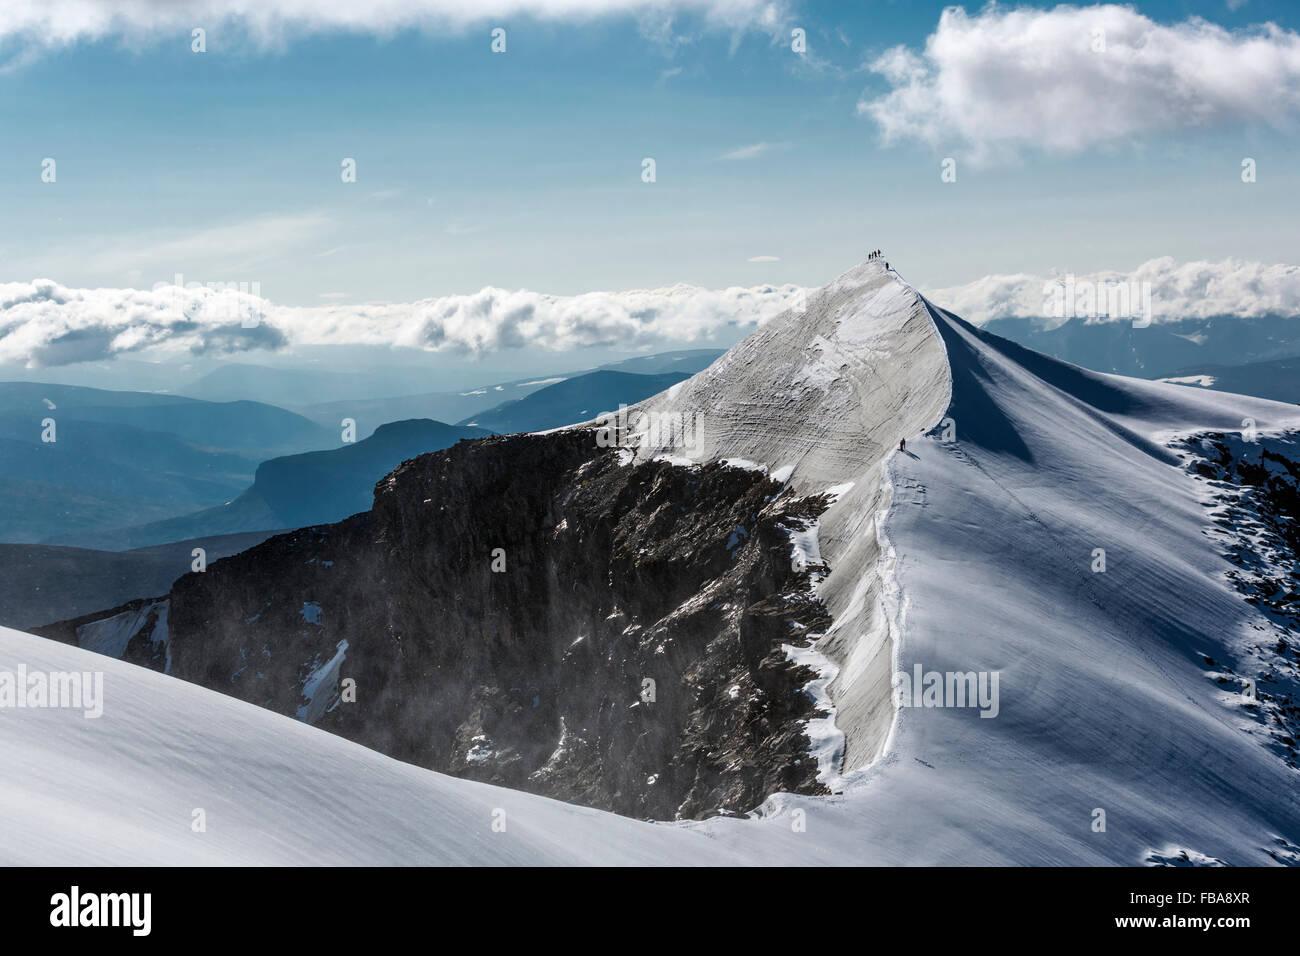 Sweden, Lapland, Snowy ridge and peak of Kebnekaise mountain - Stock Image